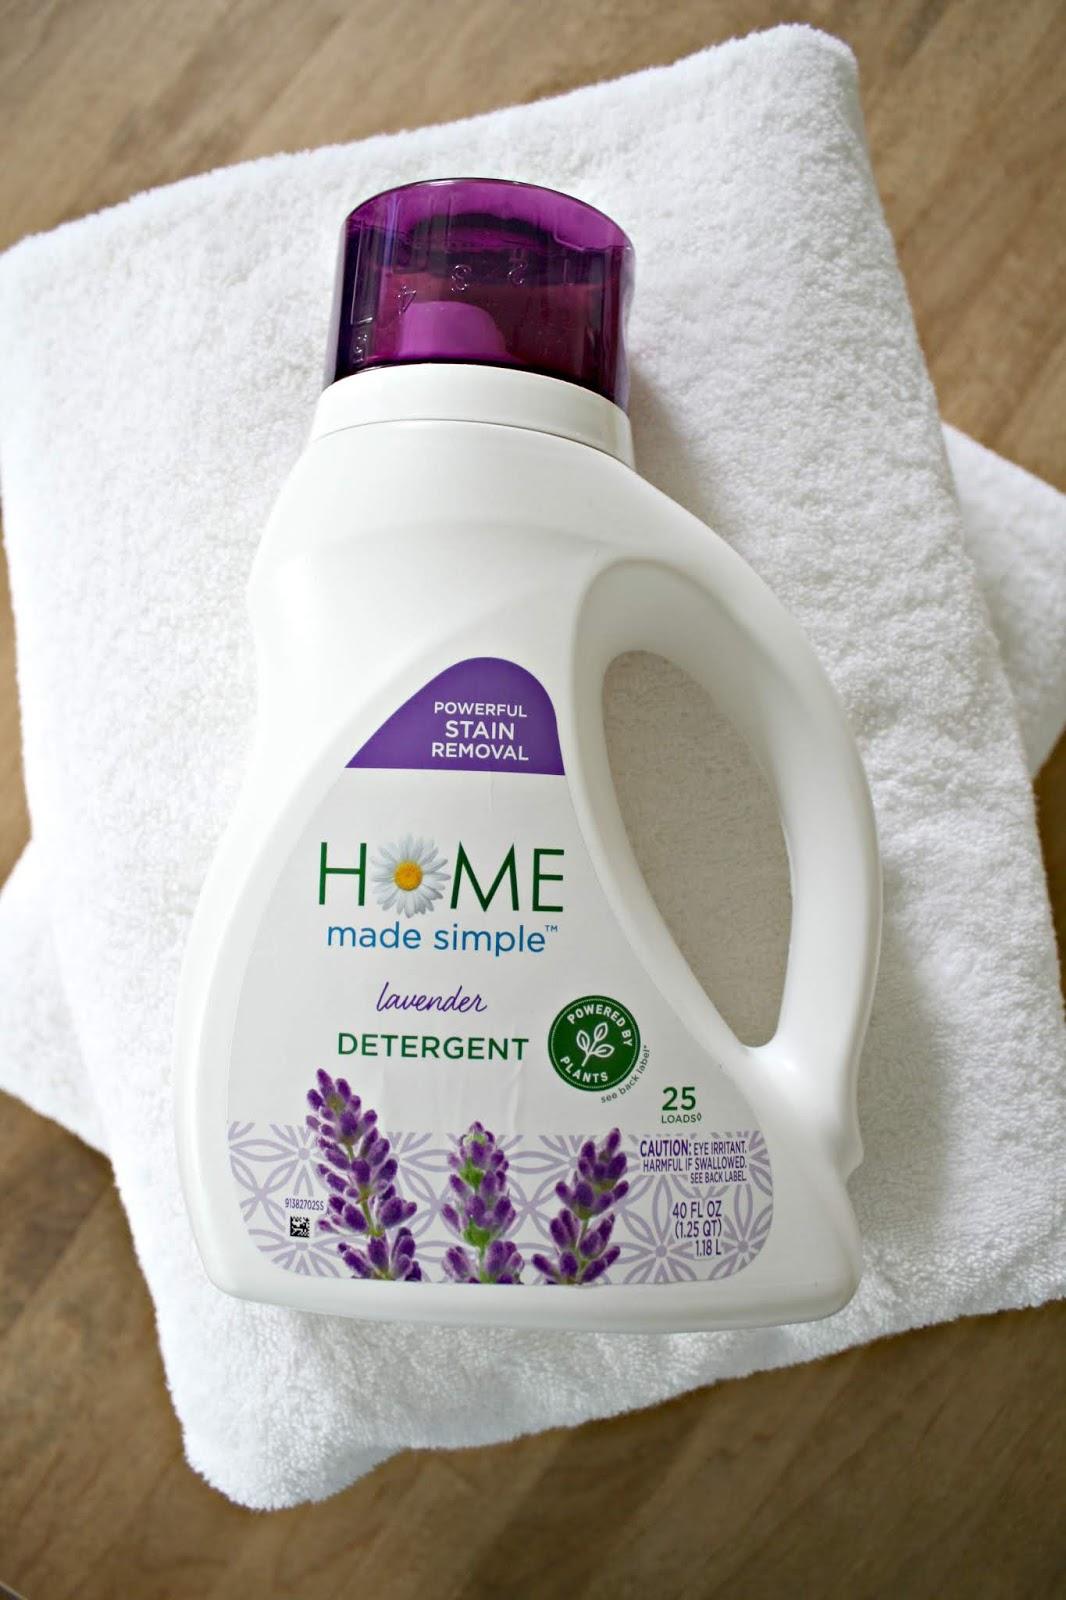 Plant-based laundry detergent